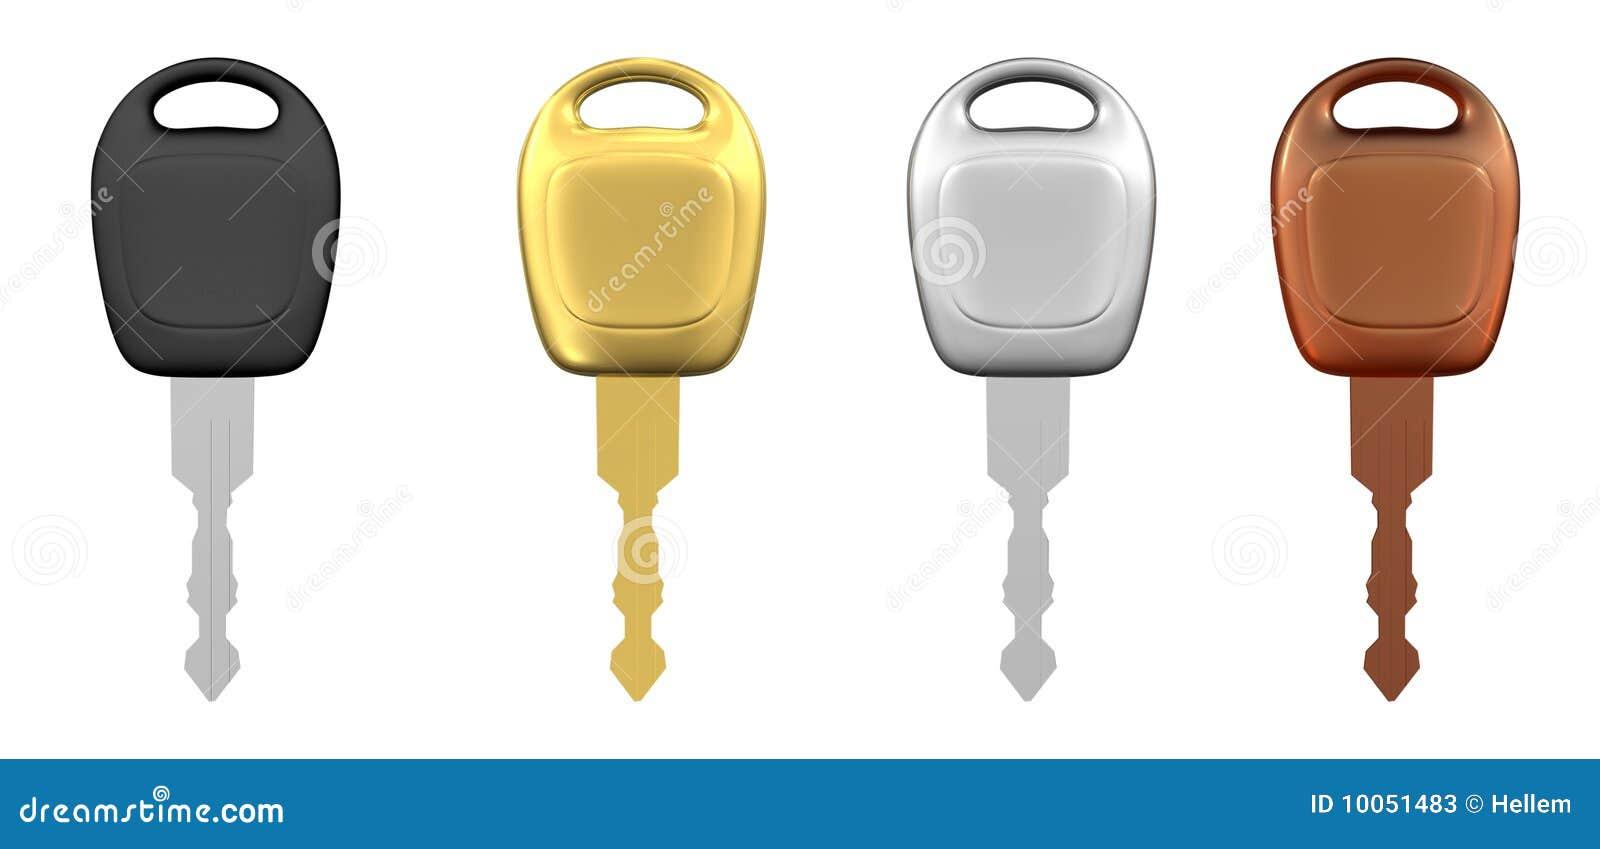 Chaves do carro de metal isoladas